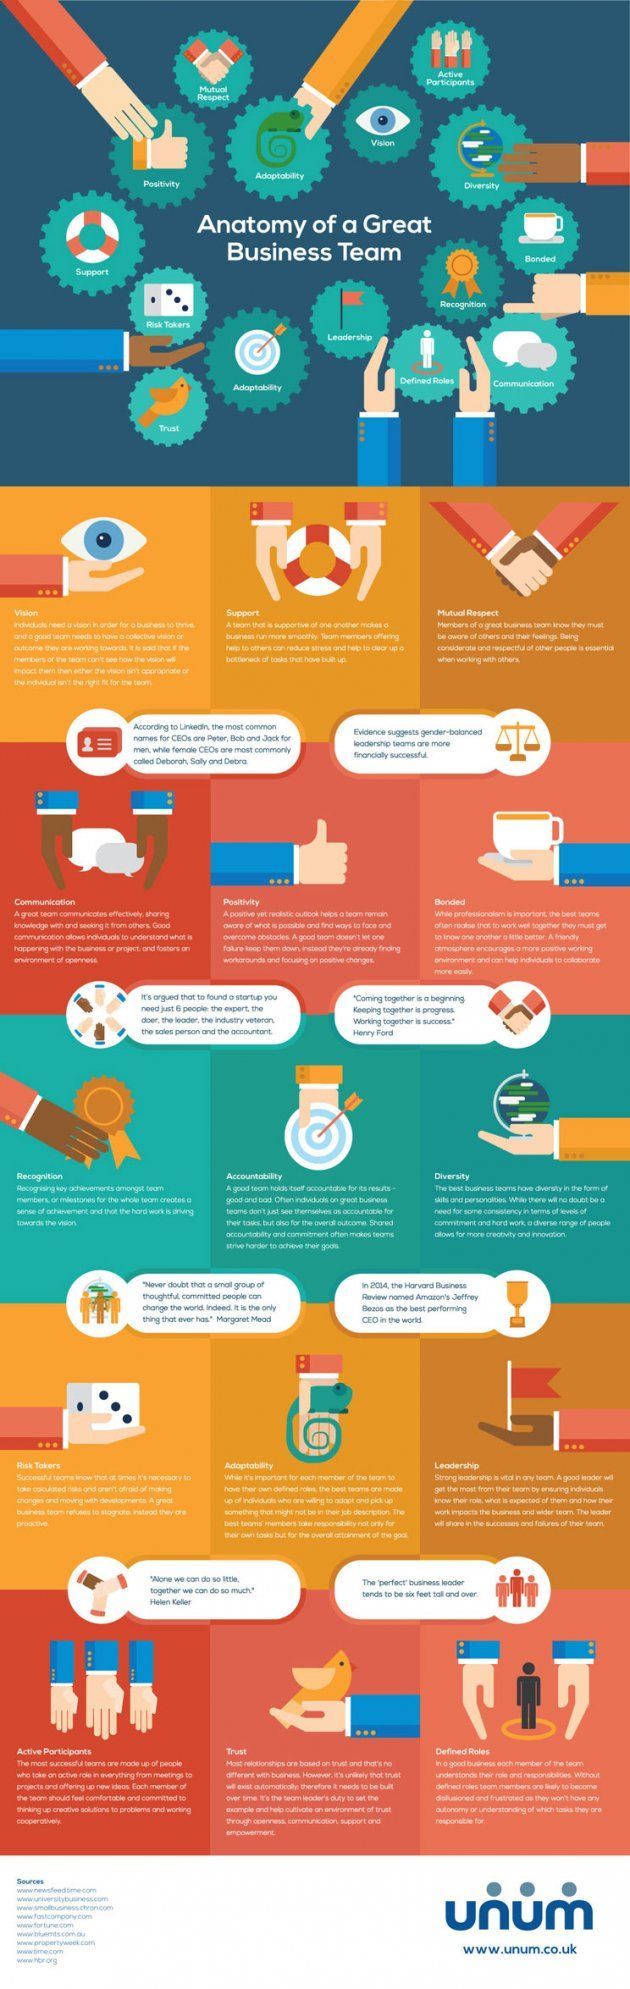 15 Characteristics of Extraordinary Teams (Infographic) | Pinterest ...